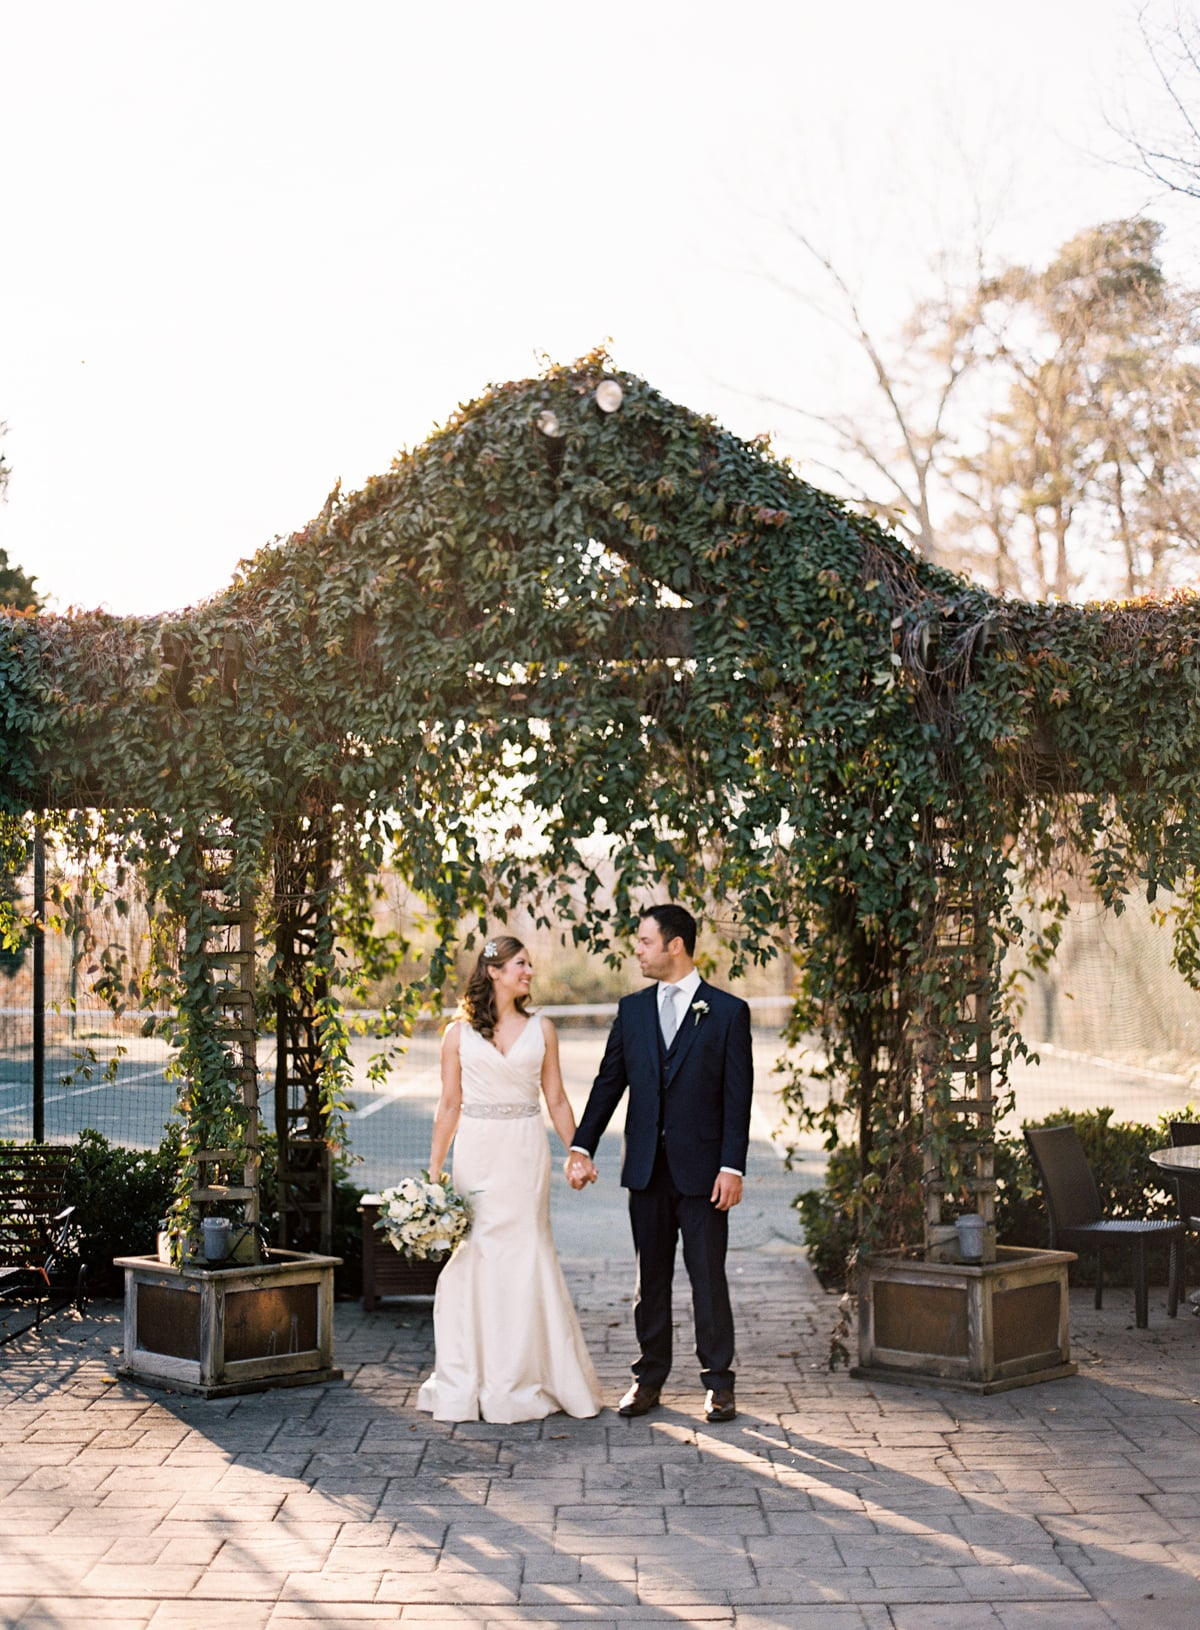 clifton-inn-wedding-031.jpg